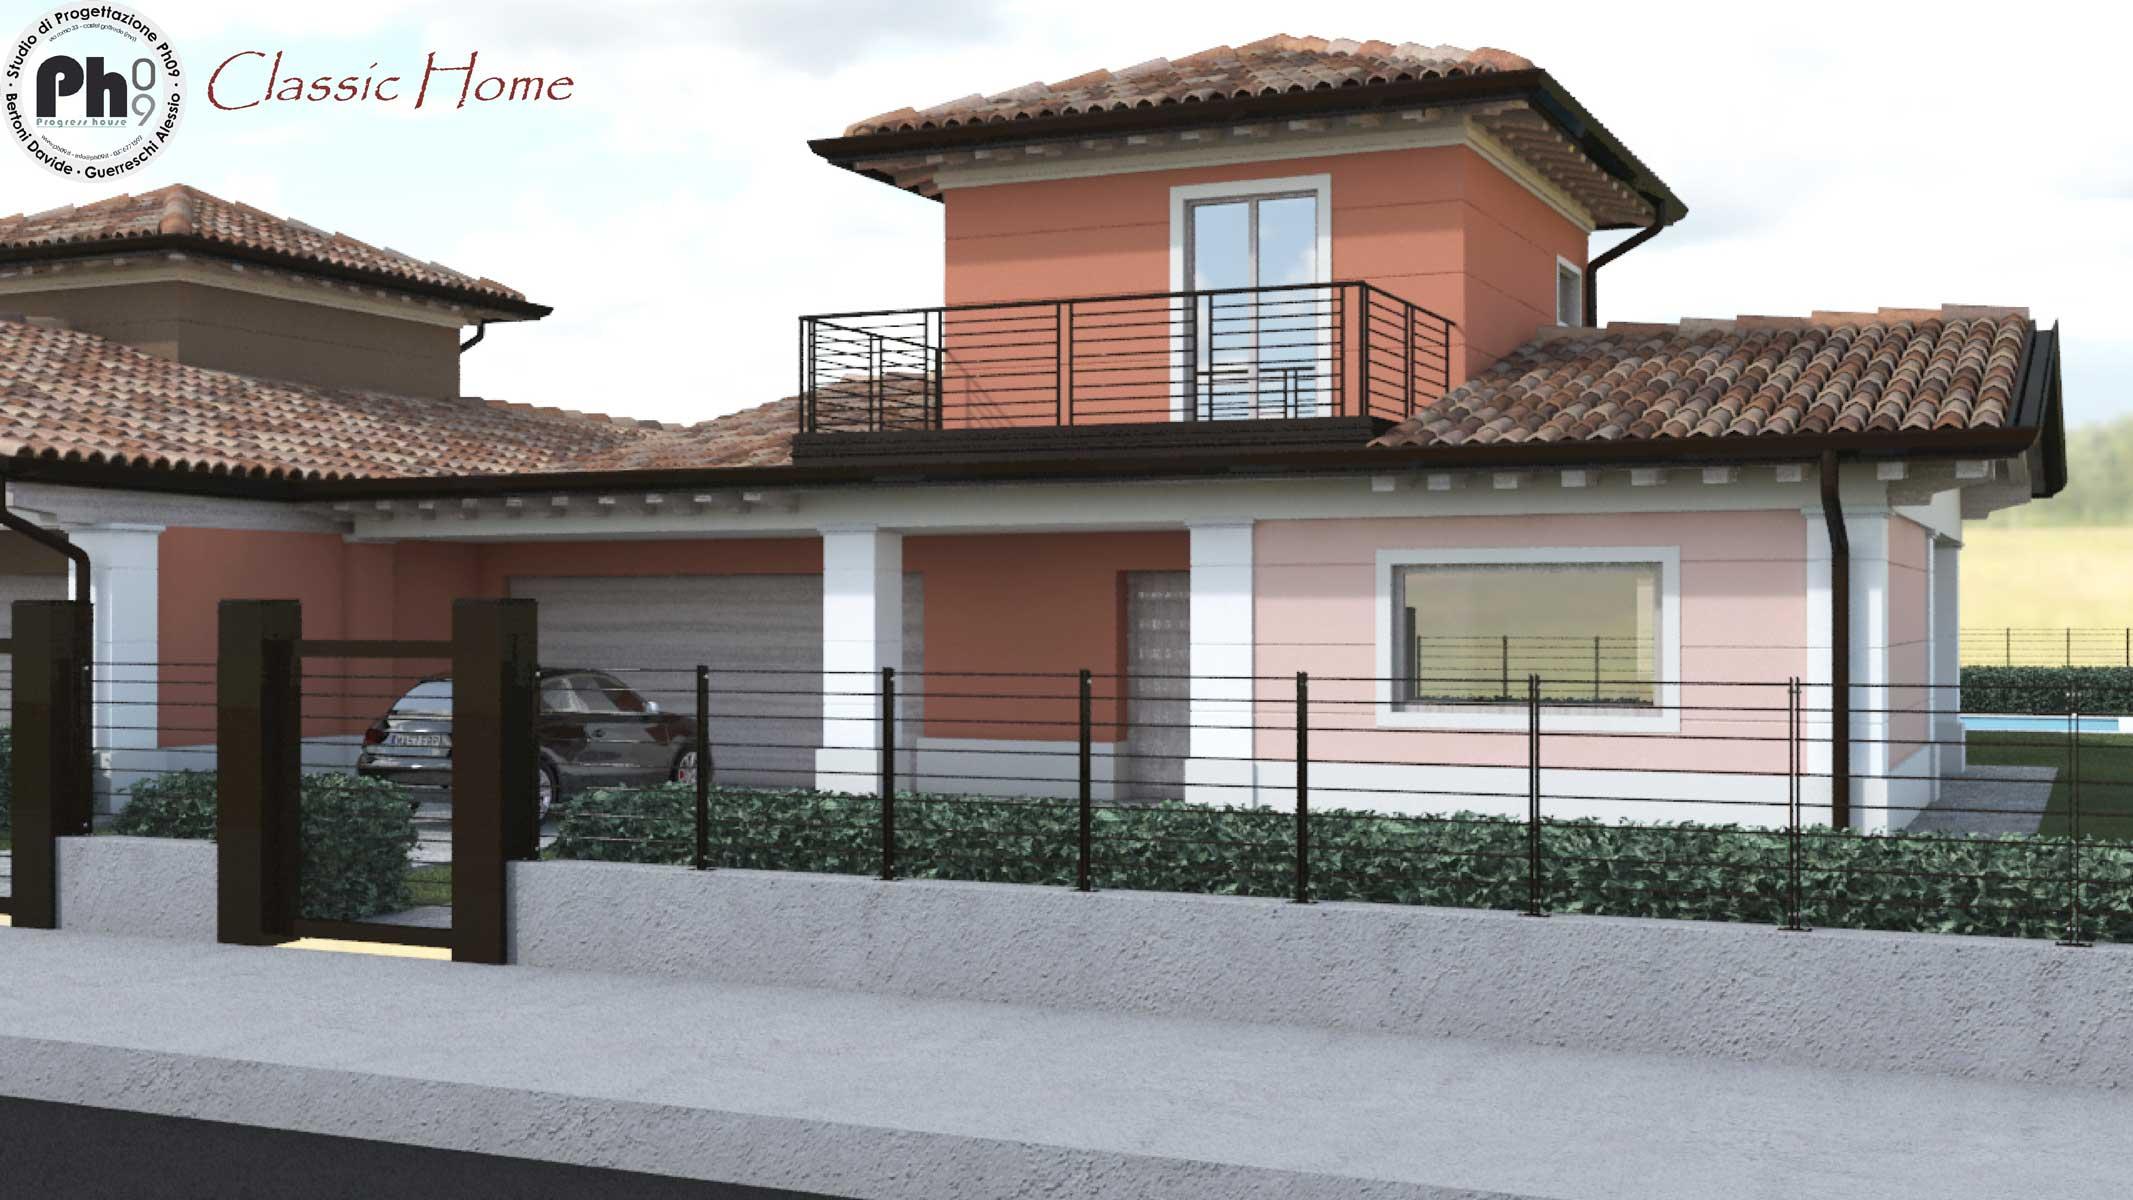 Classic-Home-Polenta-(2)